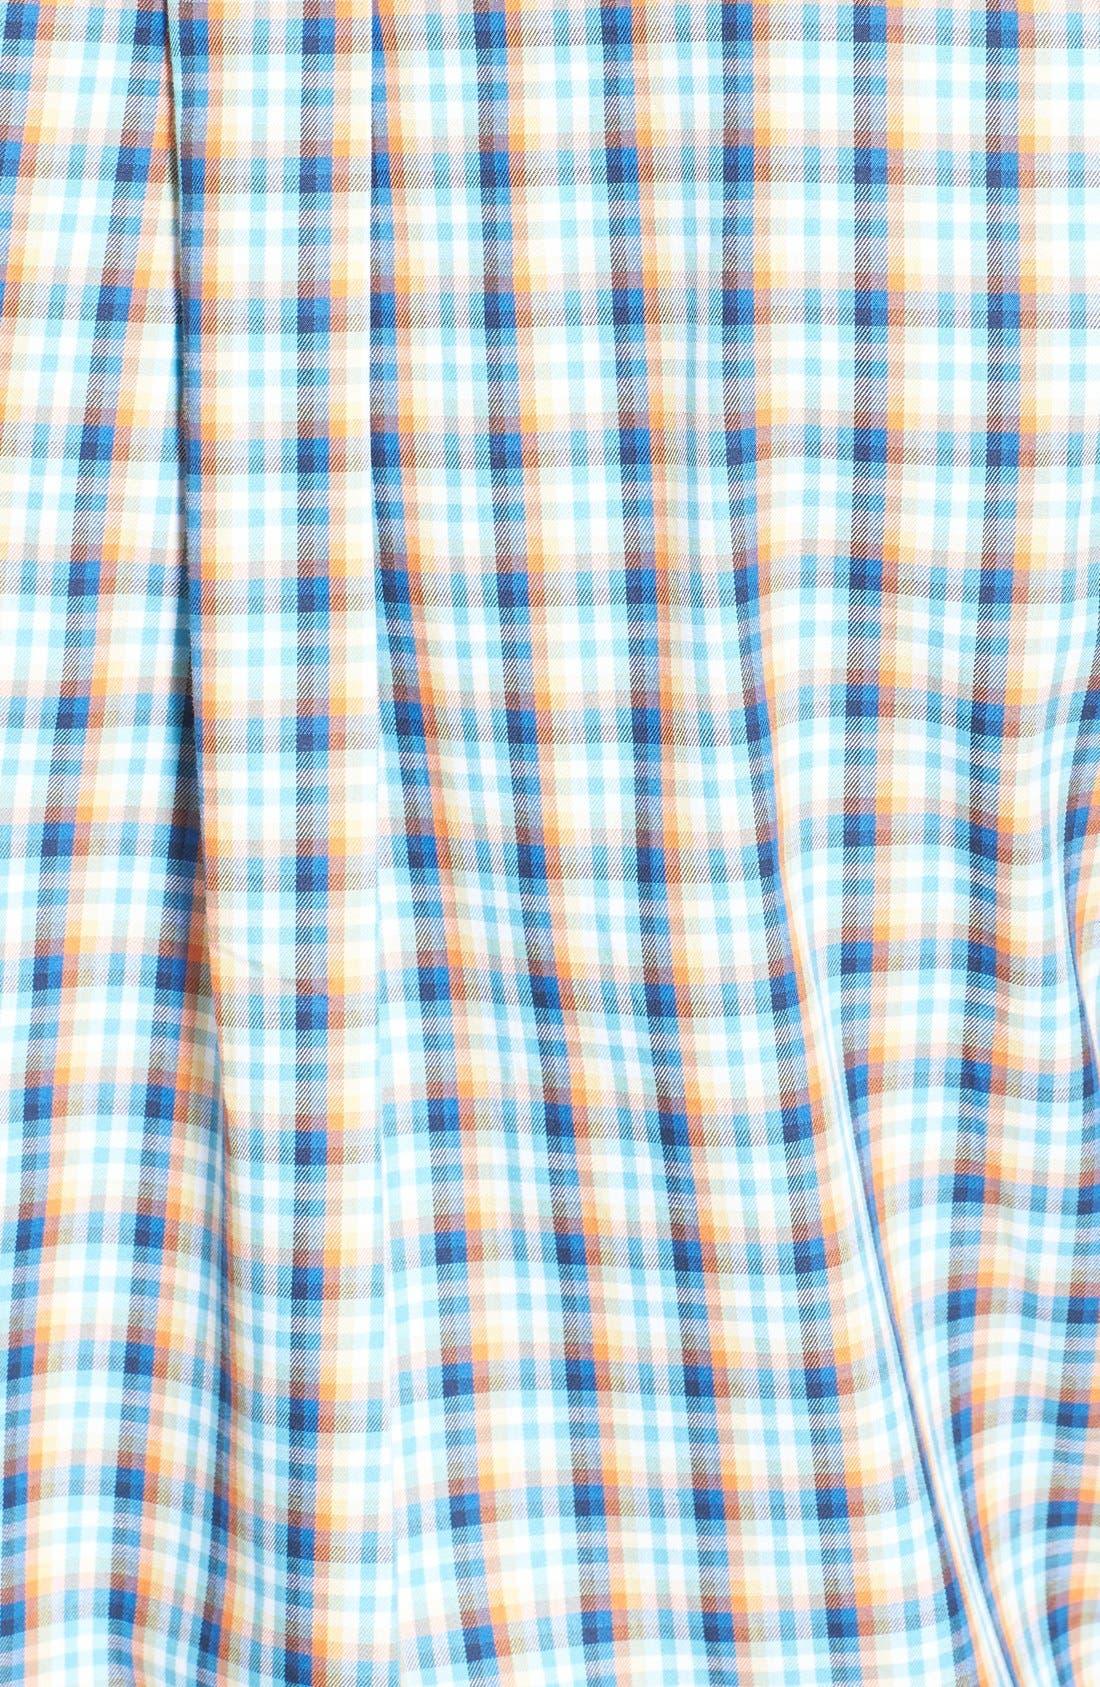 Alternate Image 3  - Cutter & Buck 'Morton Road' Classic Fit Short Sleeve Plaid Sport Shirt (Big & Tall)